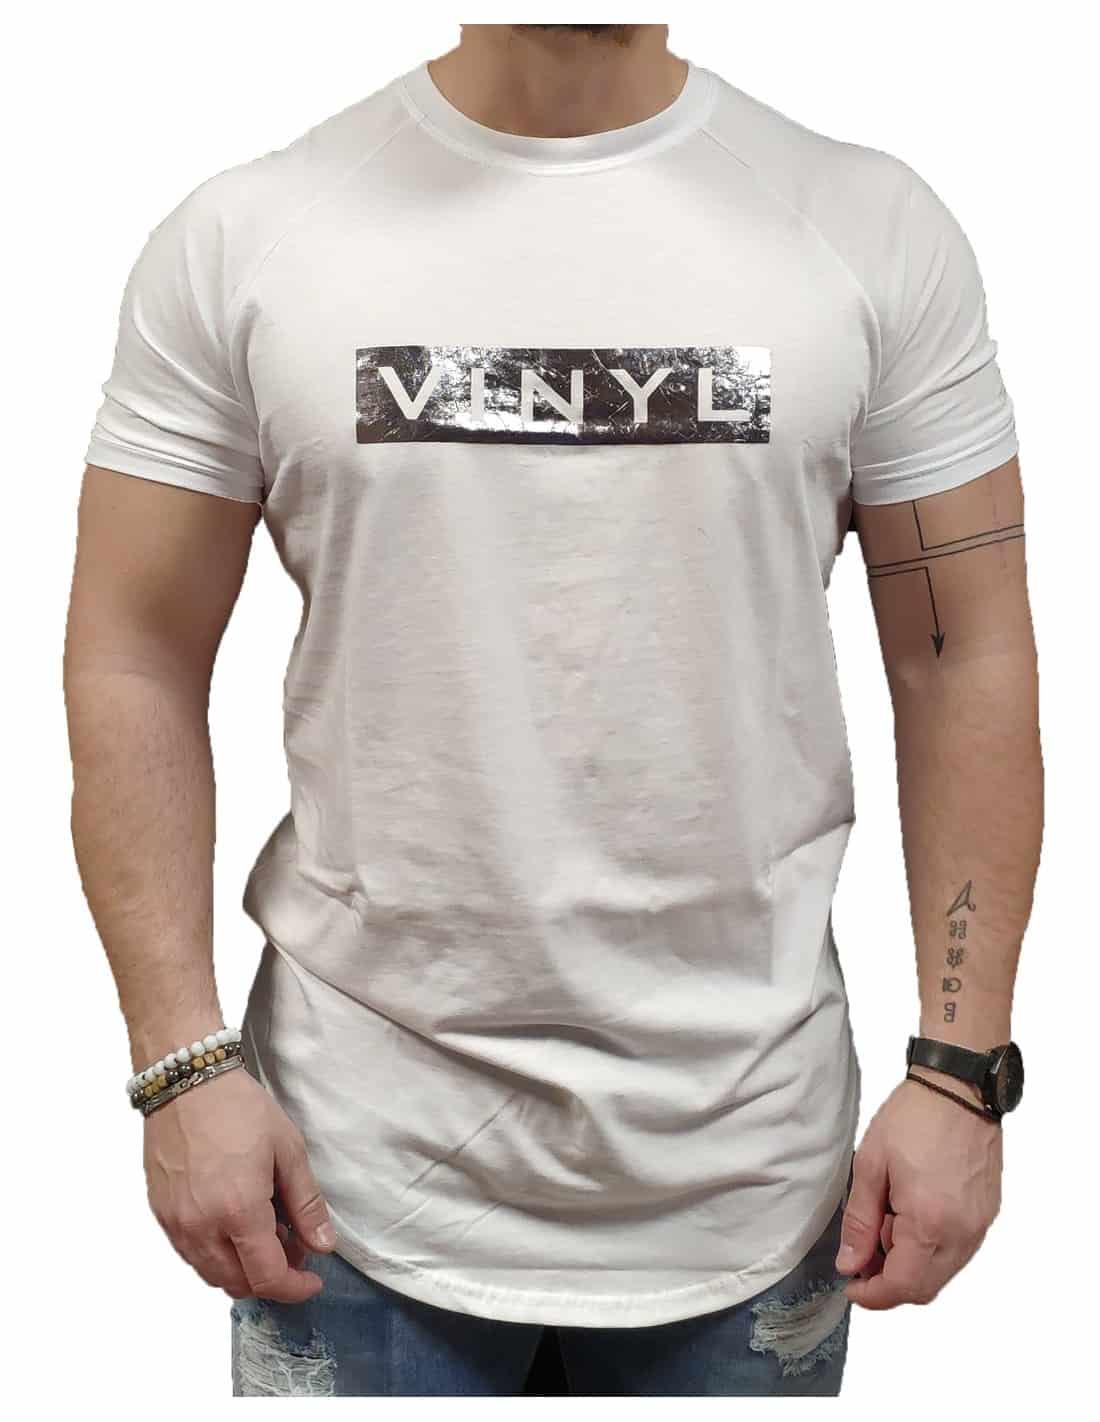 VINYL ART CLOTHING T-SHIRT ΜΕ LOGO ΛΕΥΚΟ 1